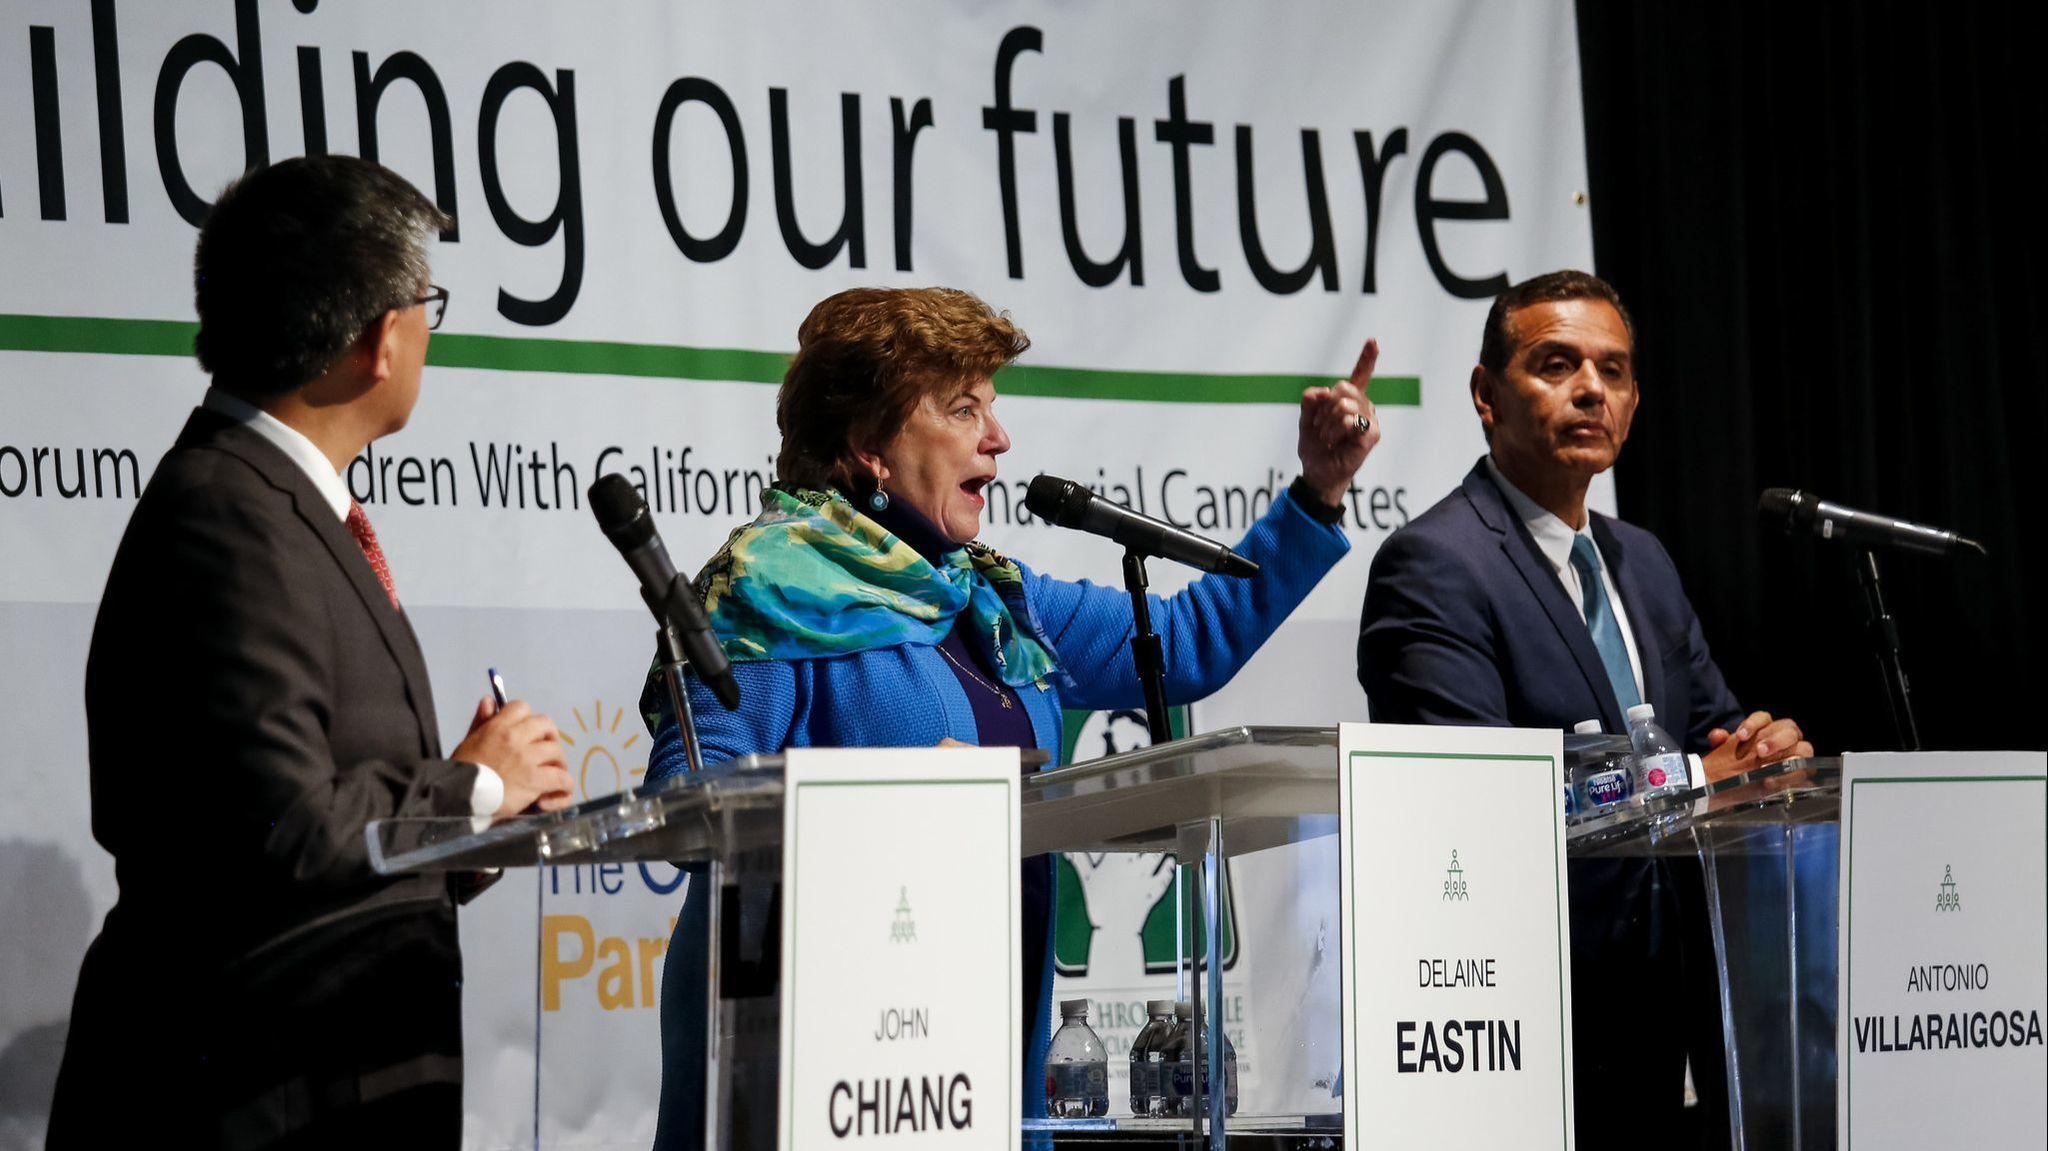 From top left: Lt. Gov. Gavin Newsom, former L.A. Mayor Antonio Villaraigosa, state Treasurer John Chiang. From bottom left: former state schools chief Delaine Eastin, John Cox,